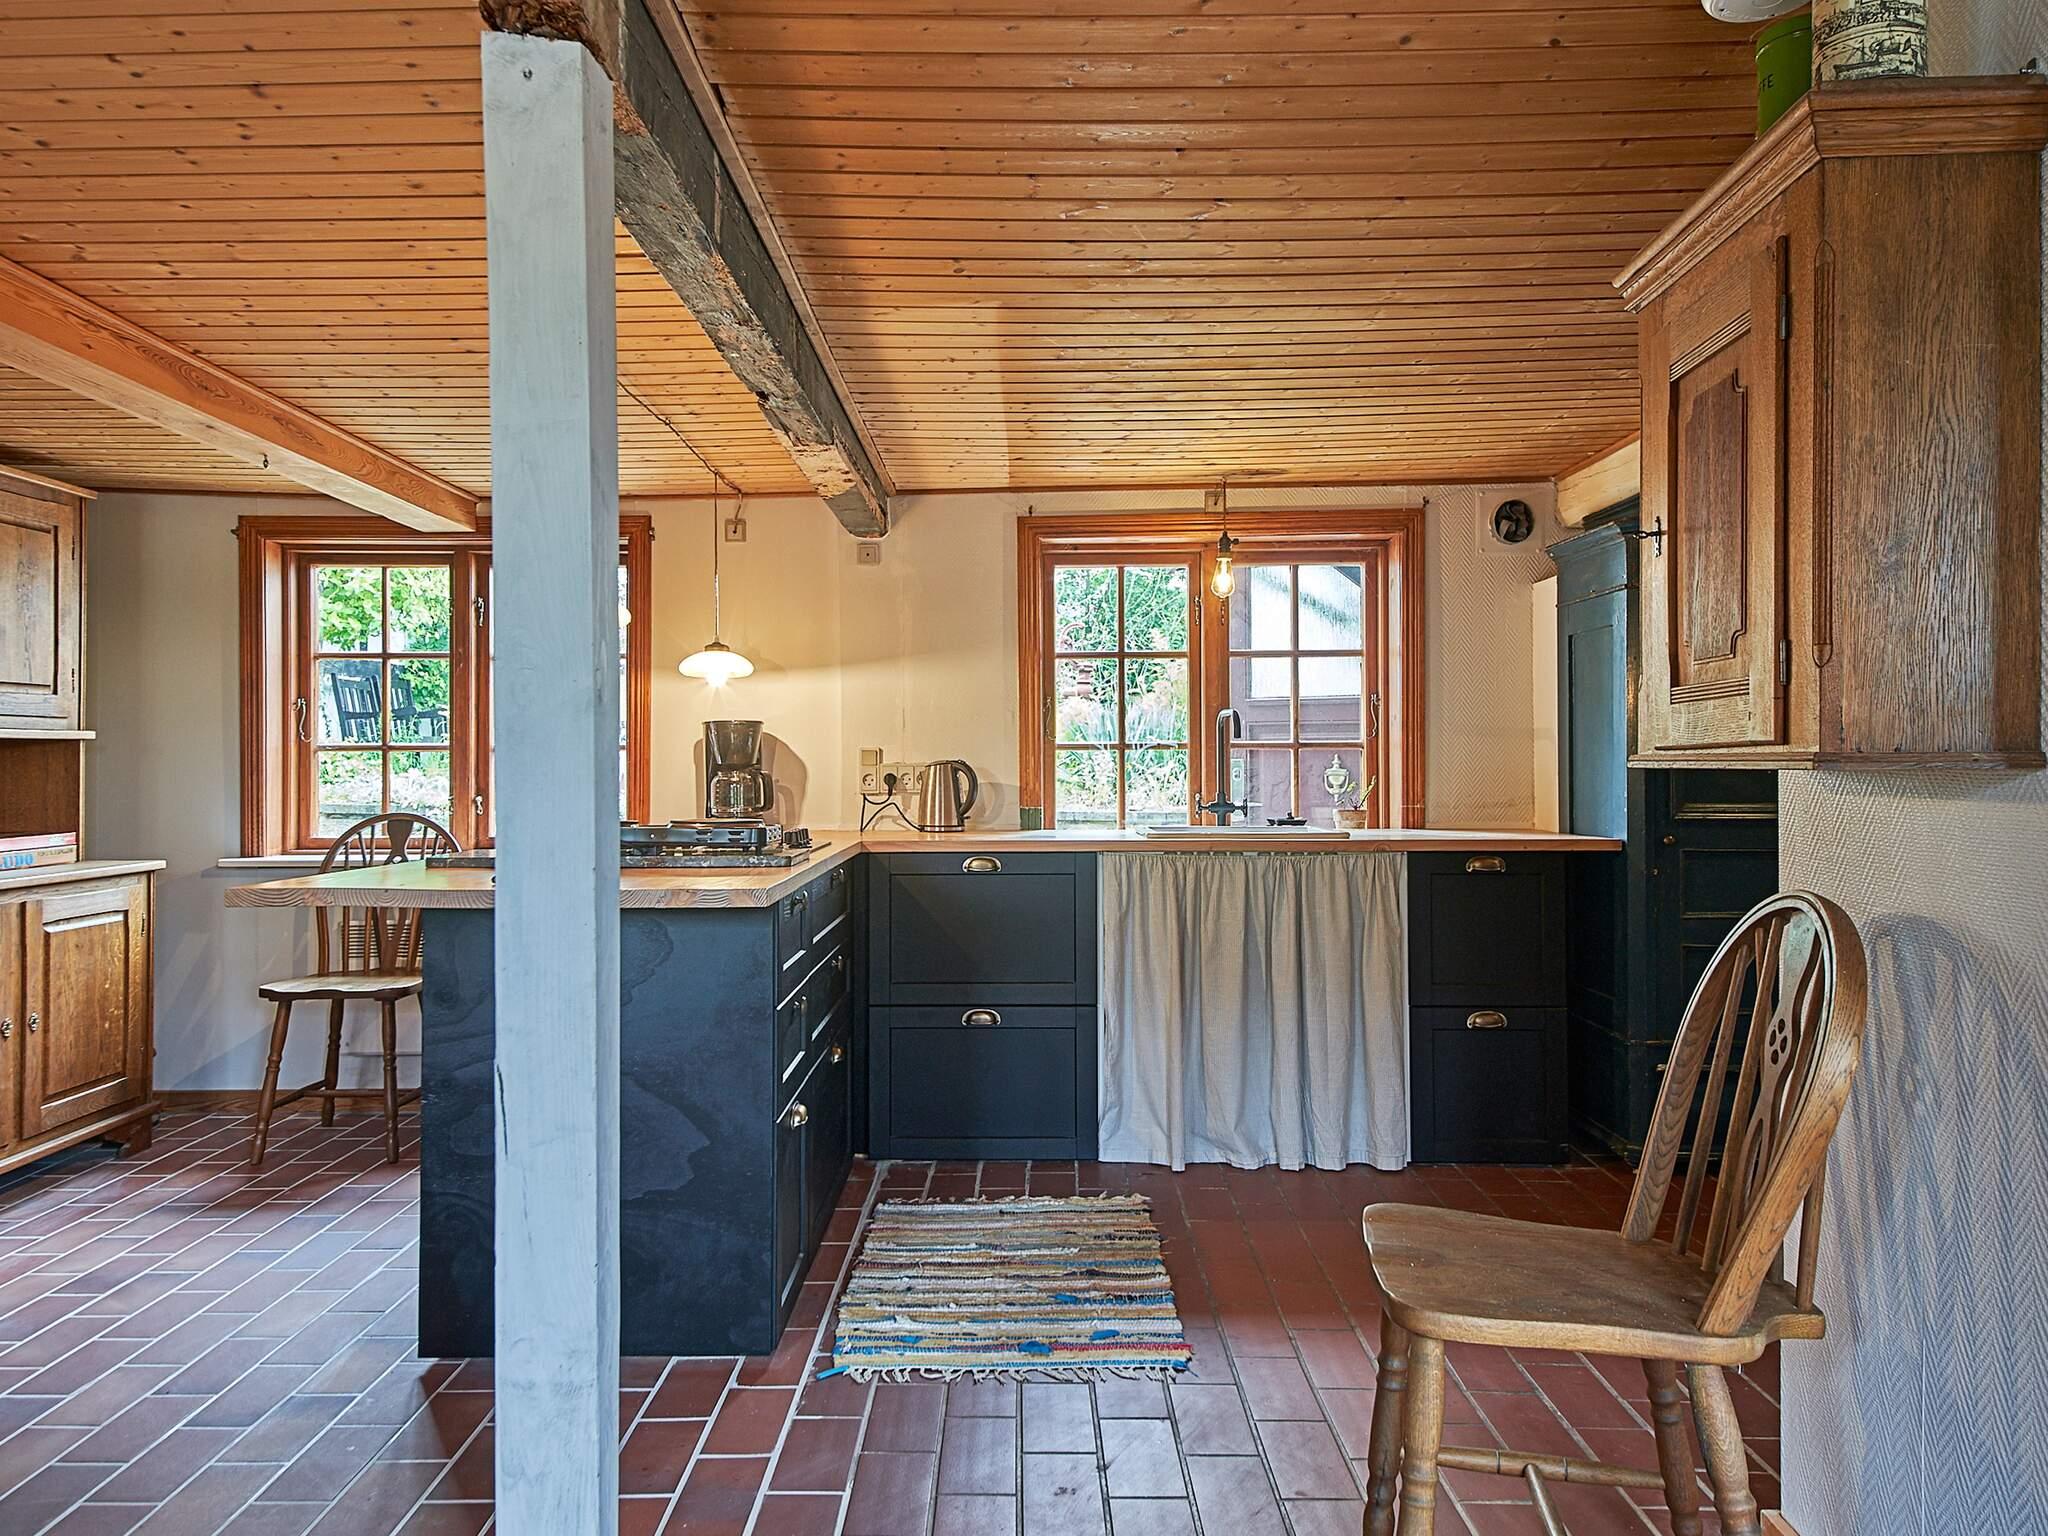 Maison de vacances Svaneke (2523728), Svaneke, , Bornholm, Danemark, image 12